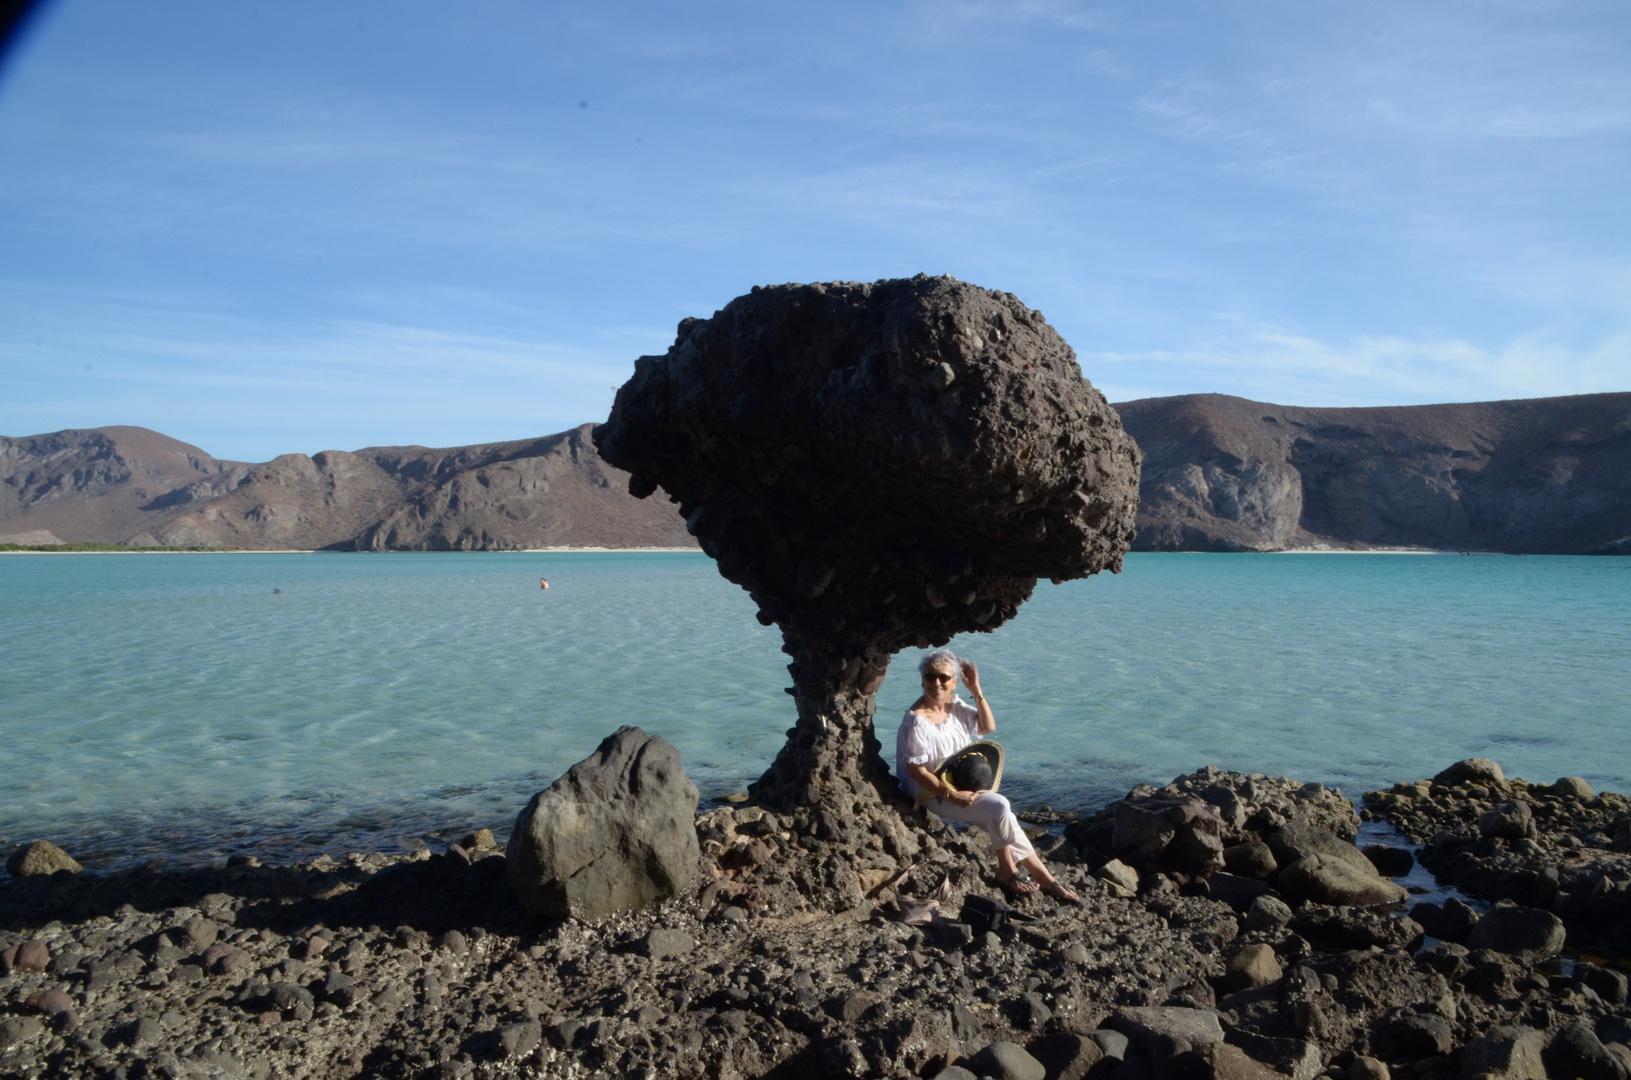 Famos piedra en la playa de valandra